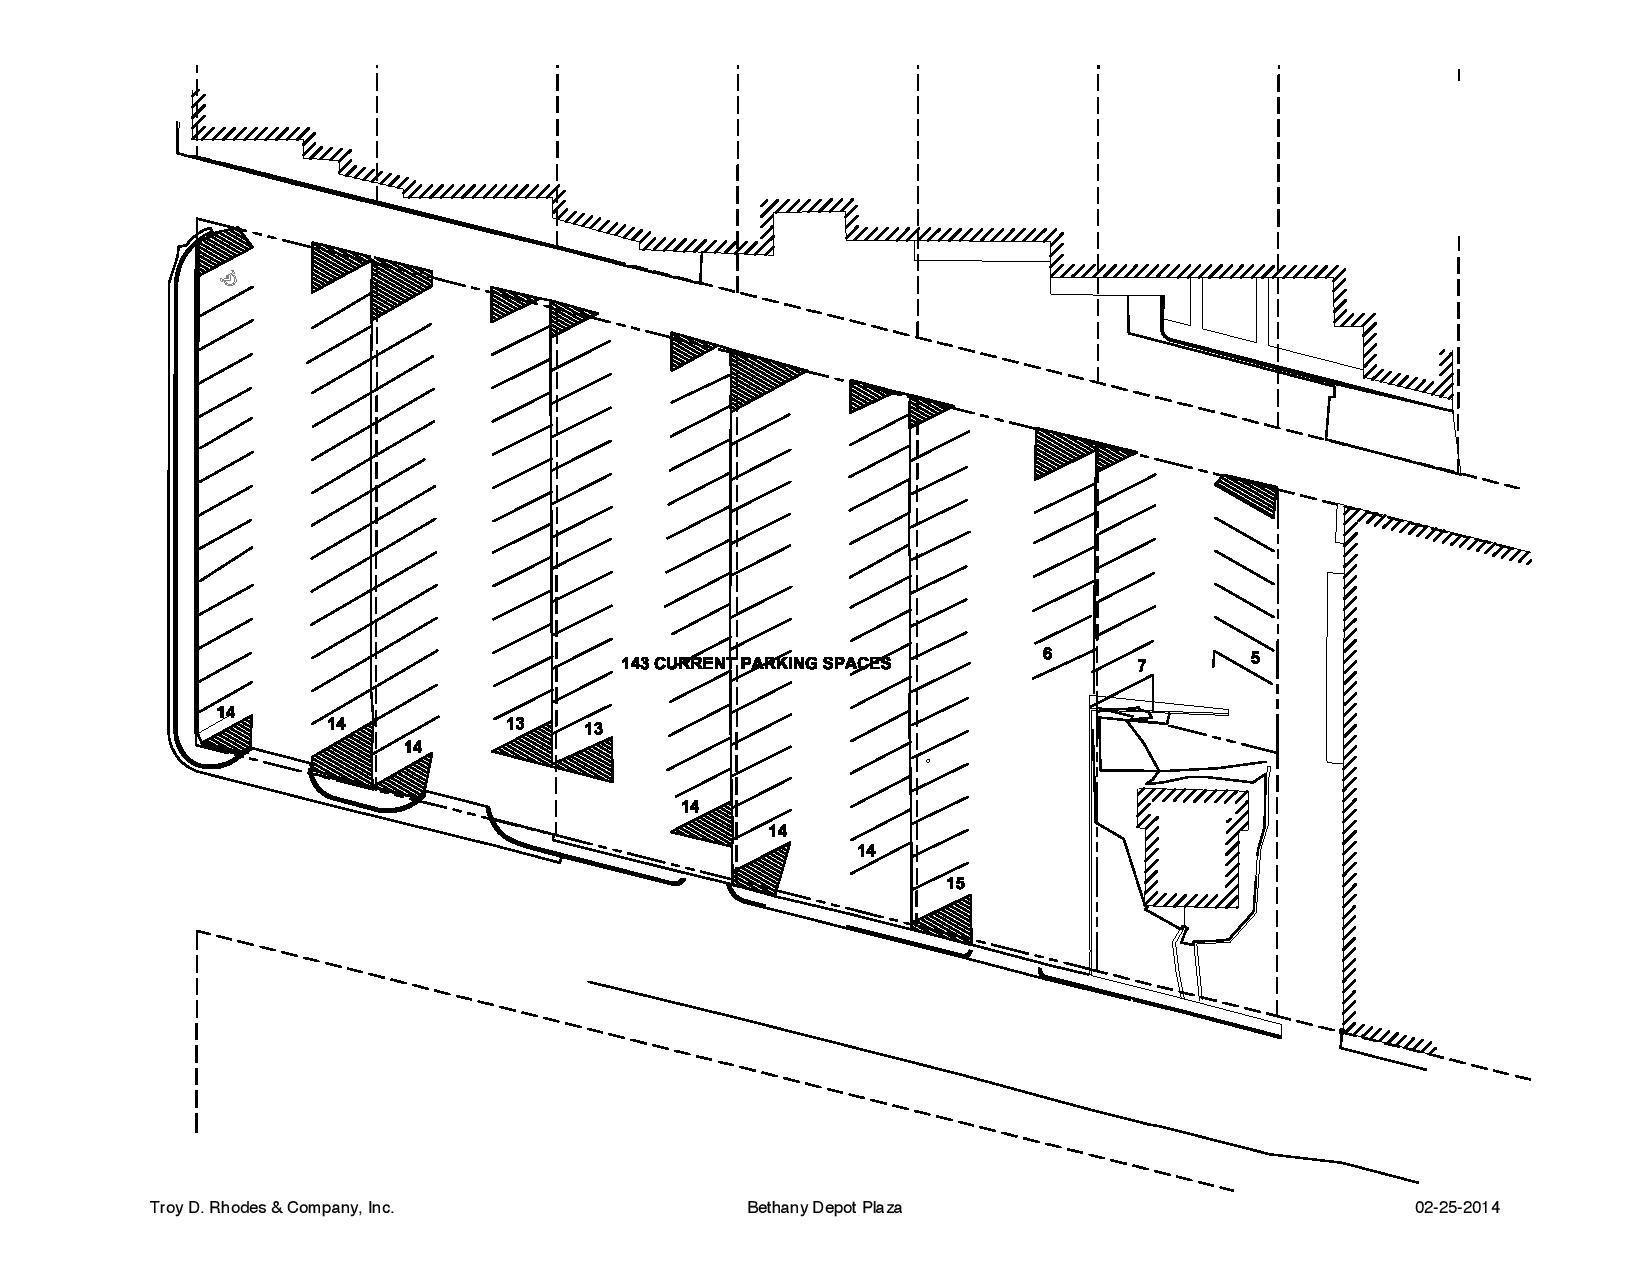 Bethany Depot Plaza Final 2-25-14-page-002.jpg